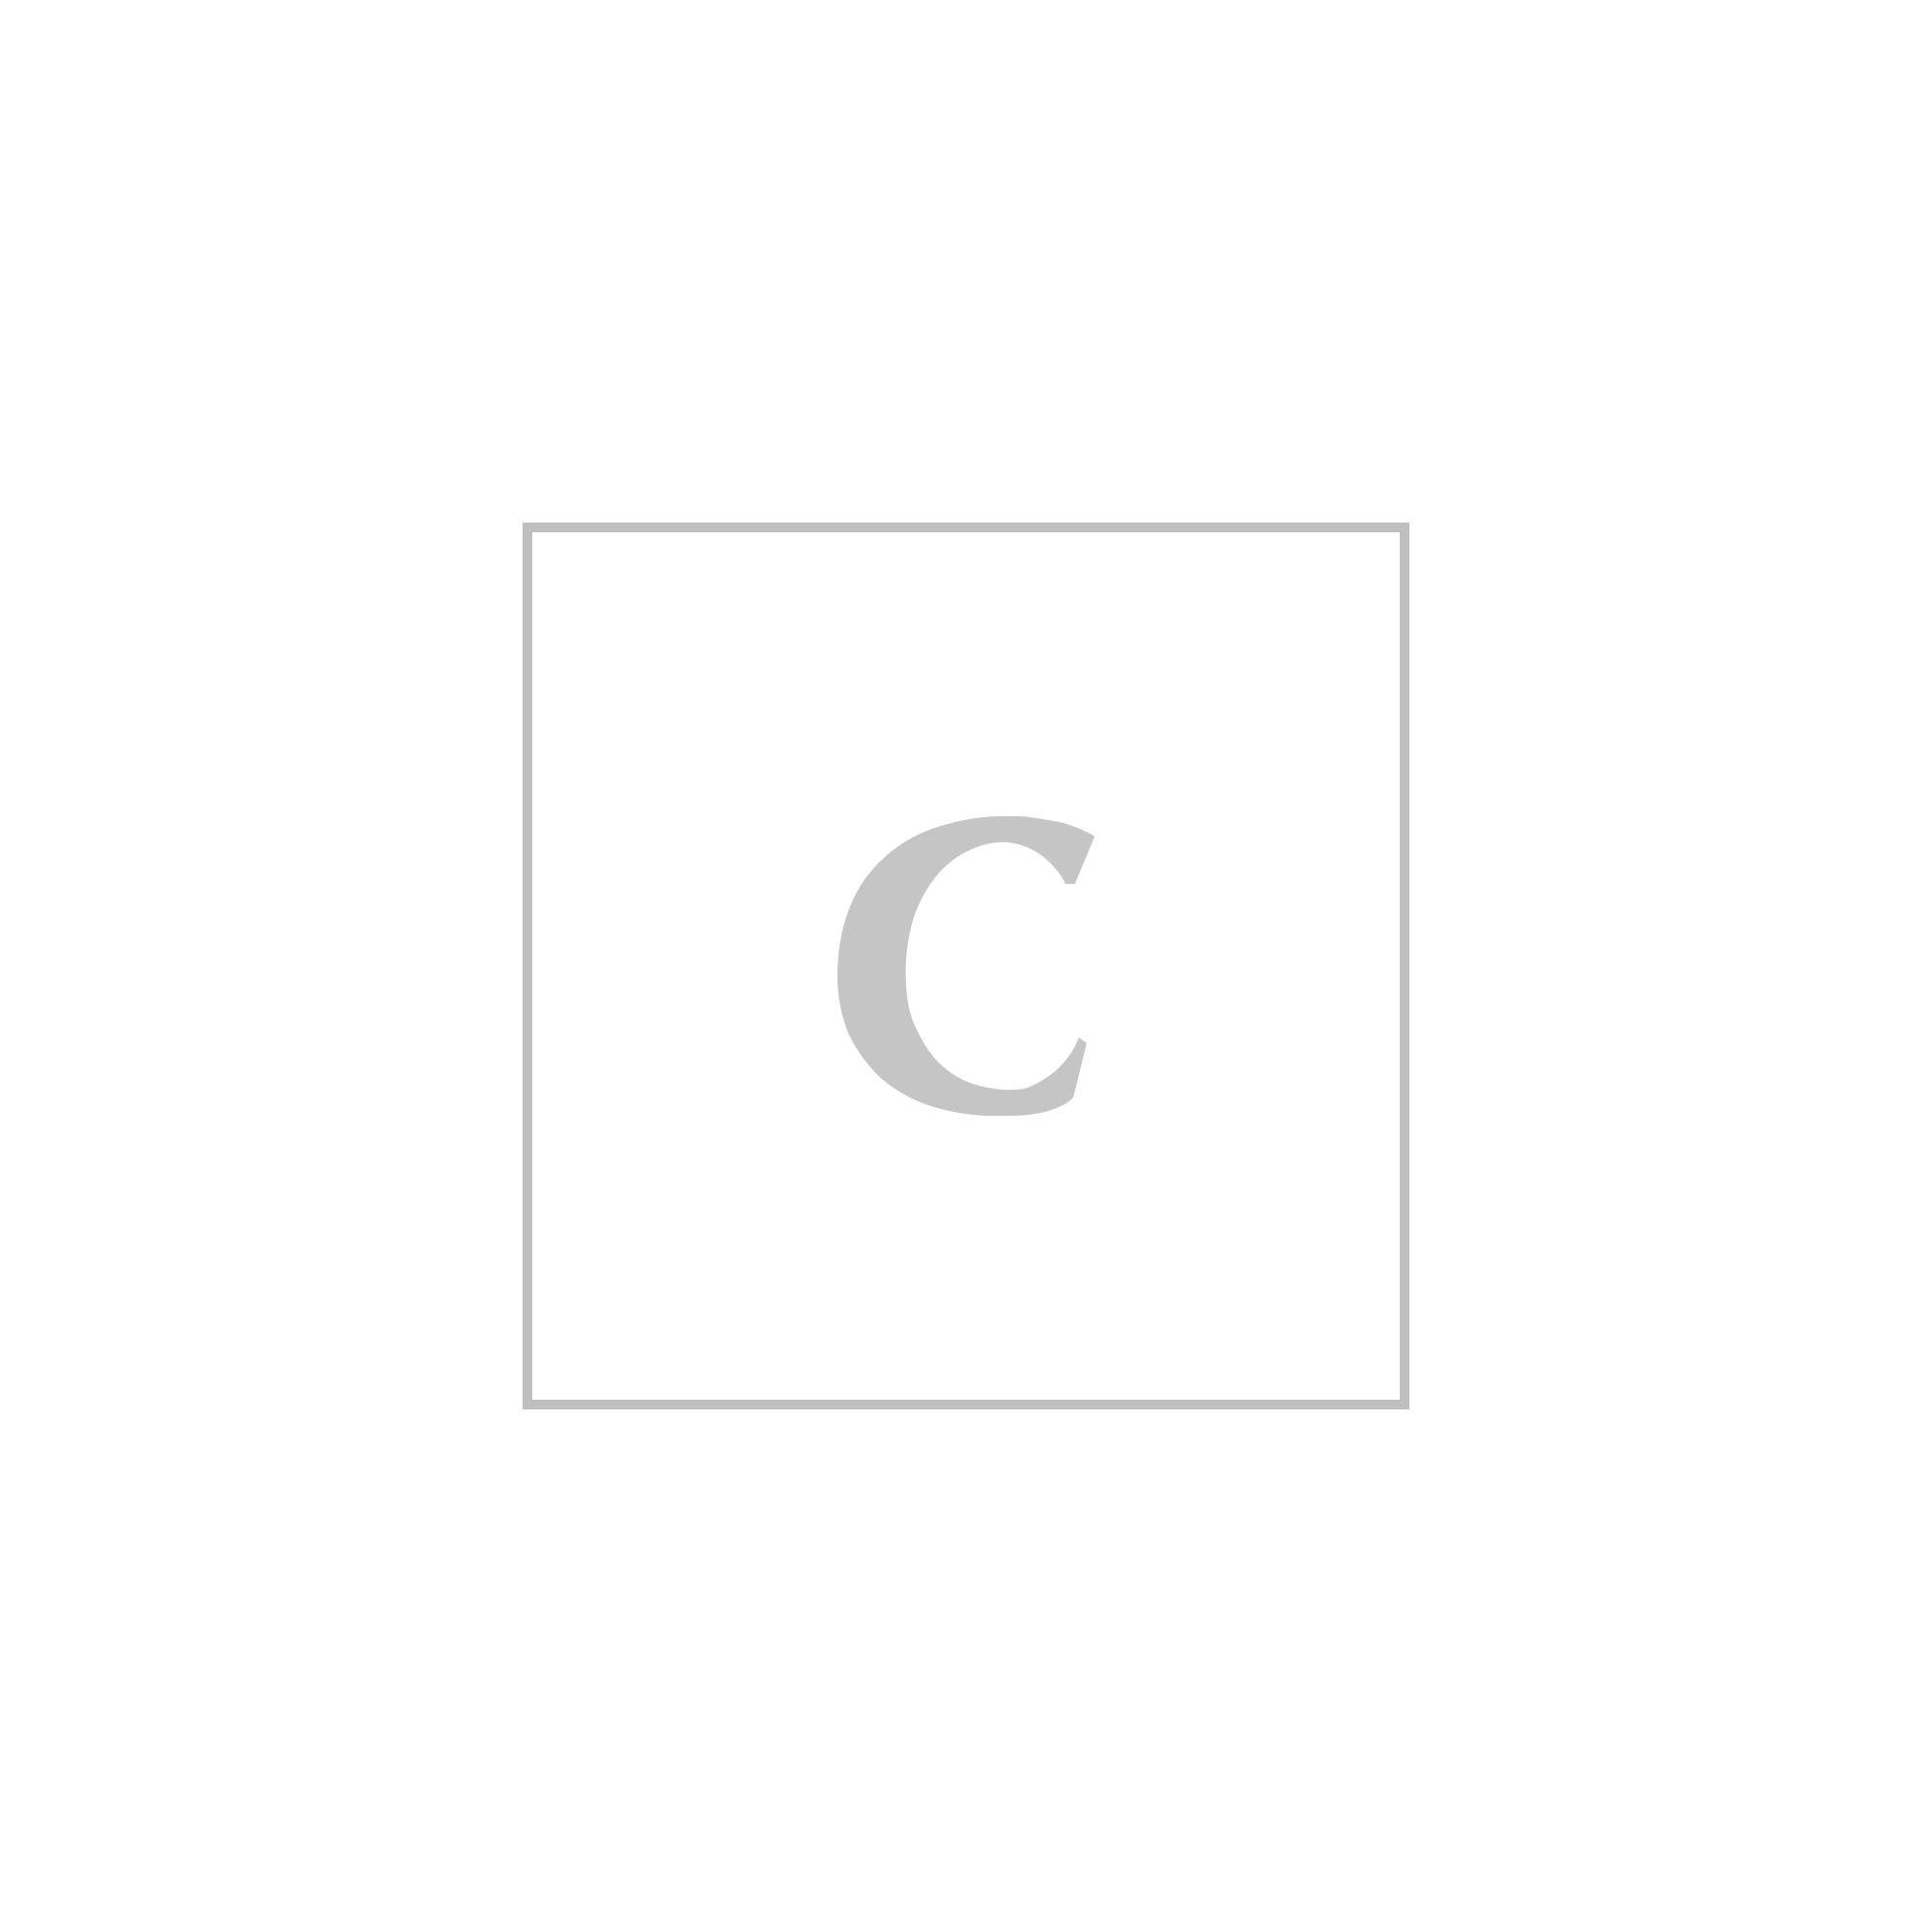 Salvatore ferragamo p.foglio 22b300 119 tissu soft